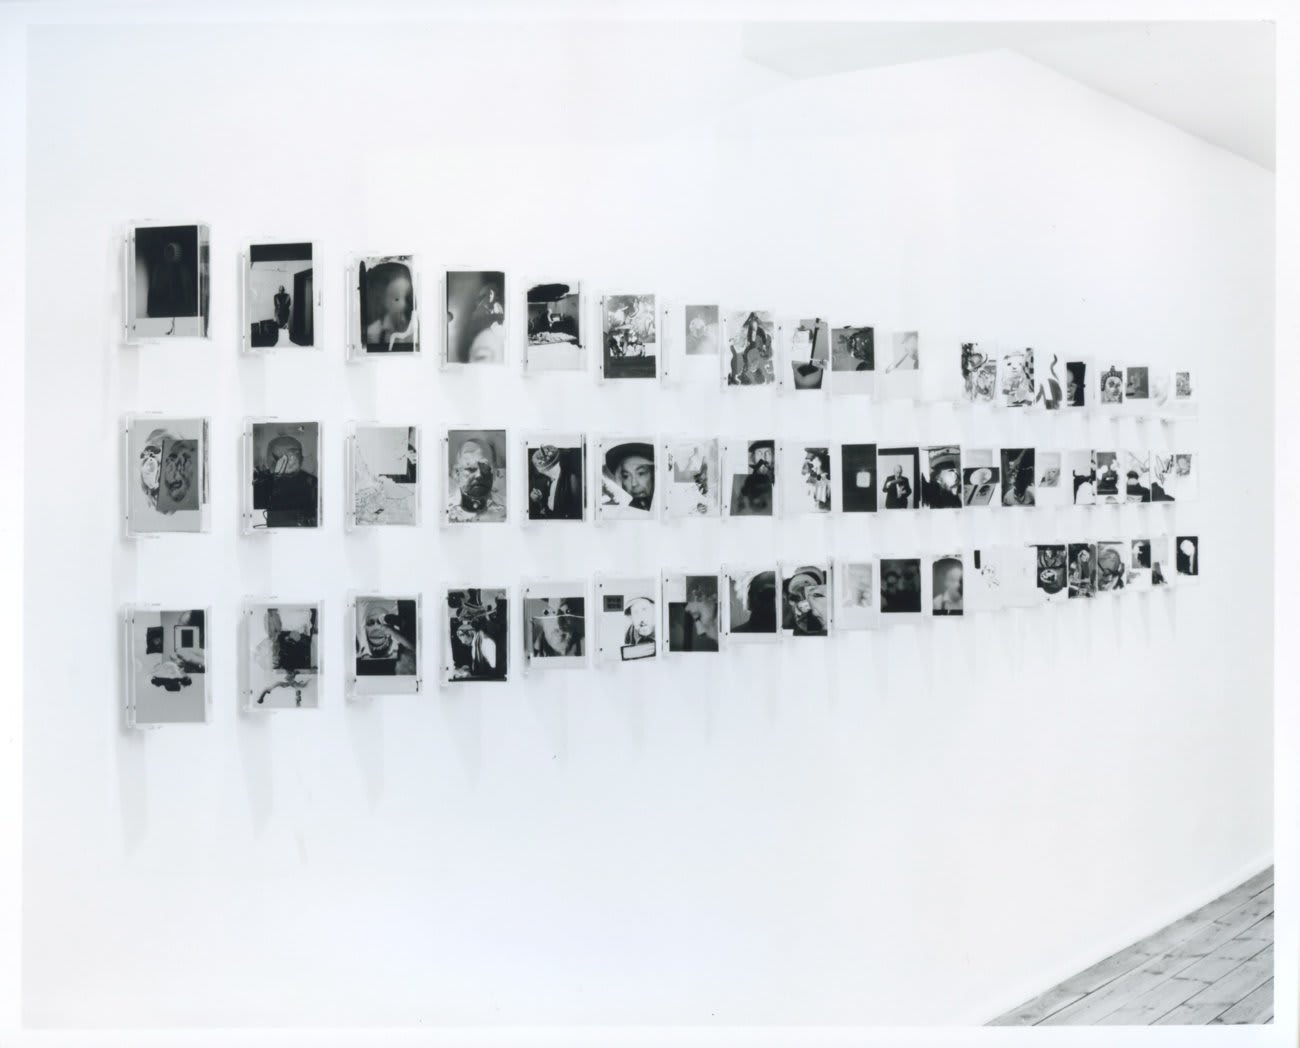 Richard Hamilton & Dieter Roth: Interfaces, installation view, February 1990